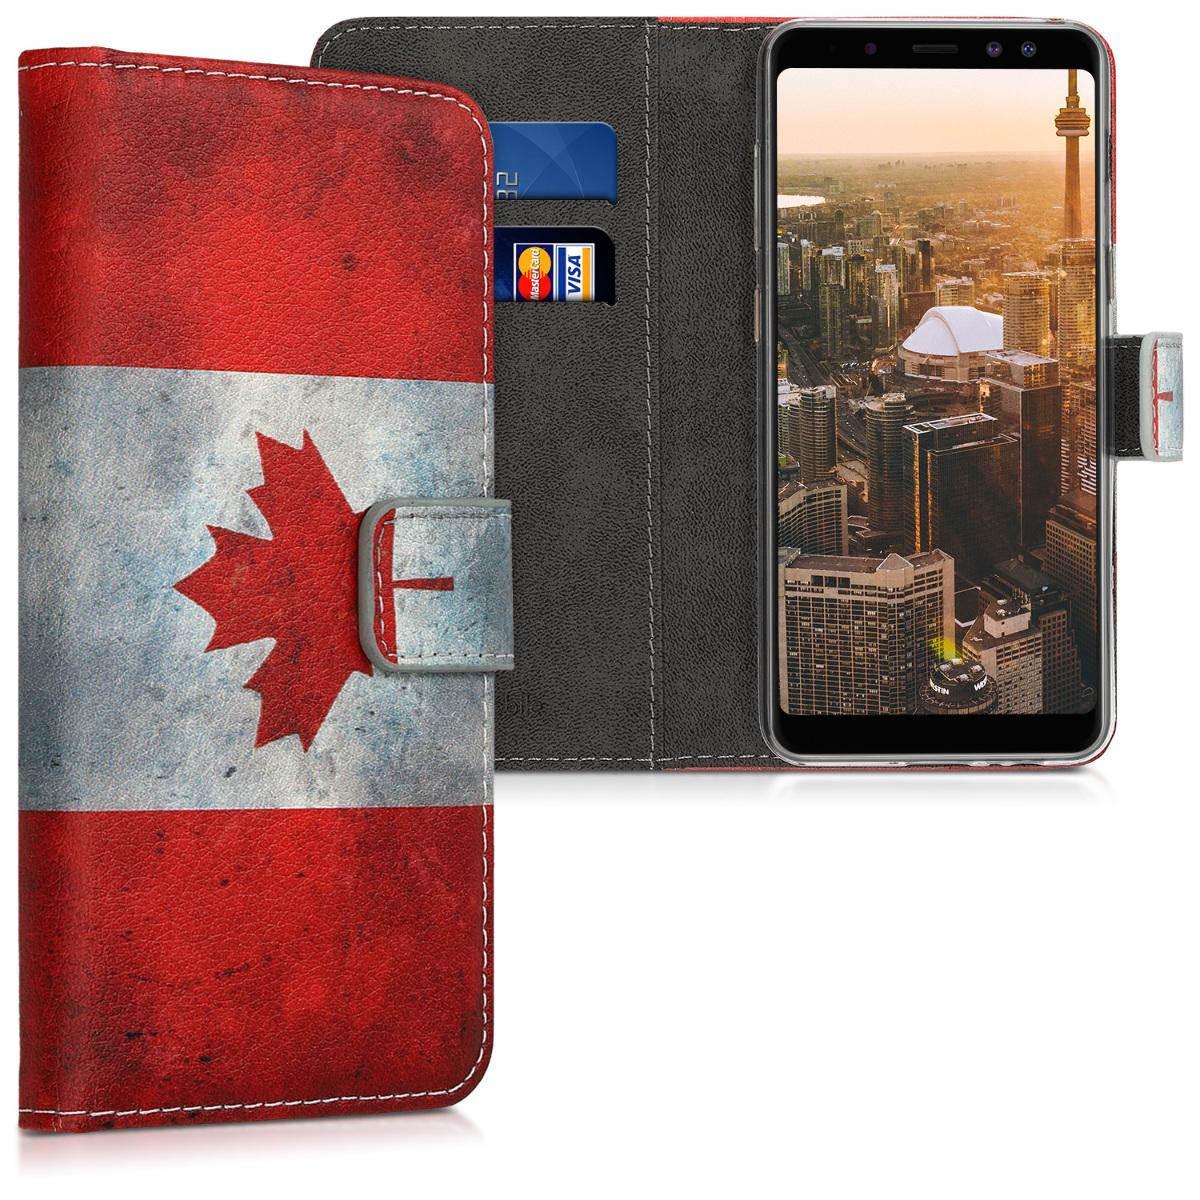 Kožené pouzdro pro Samsung A8 (2018) - Kanadská vlajka červené / bílé